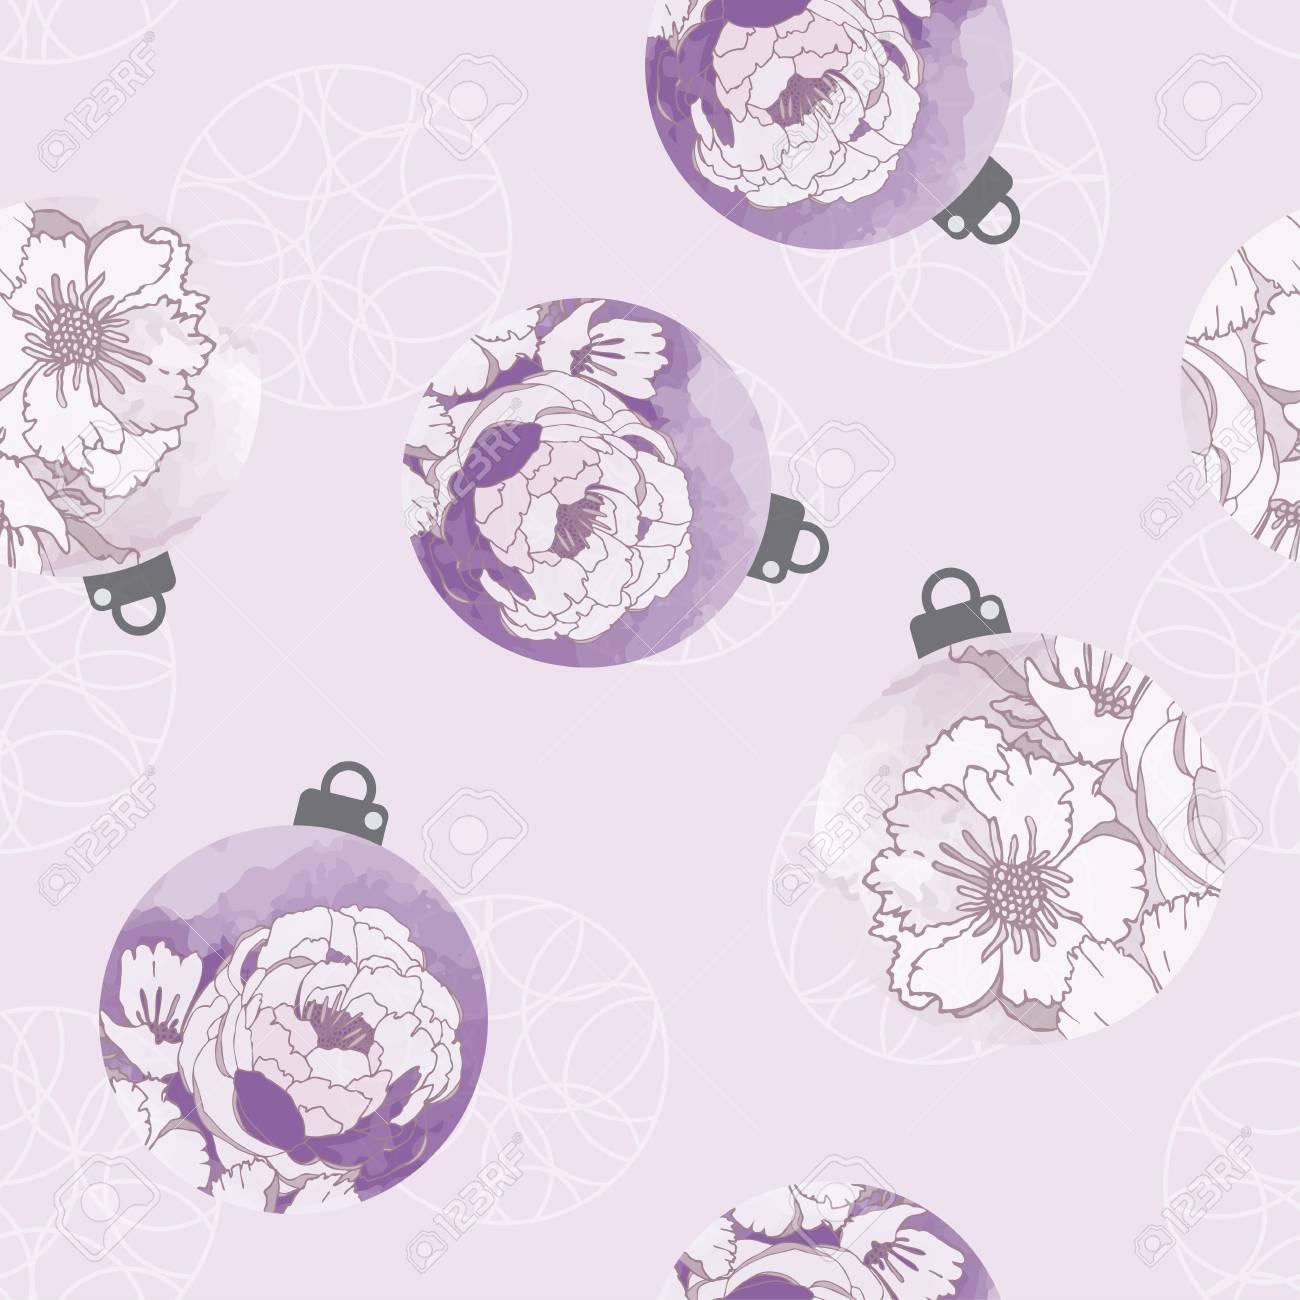 Sfondi desktop di fiori